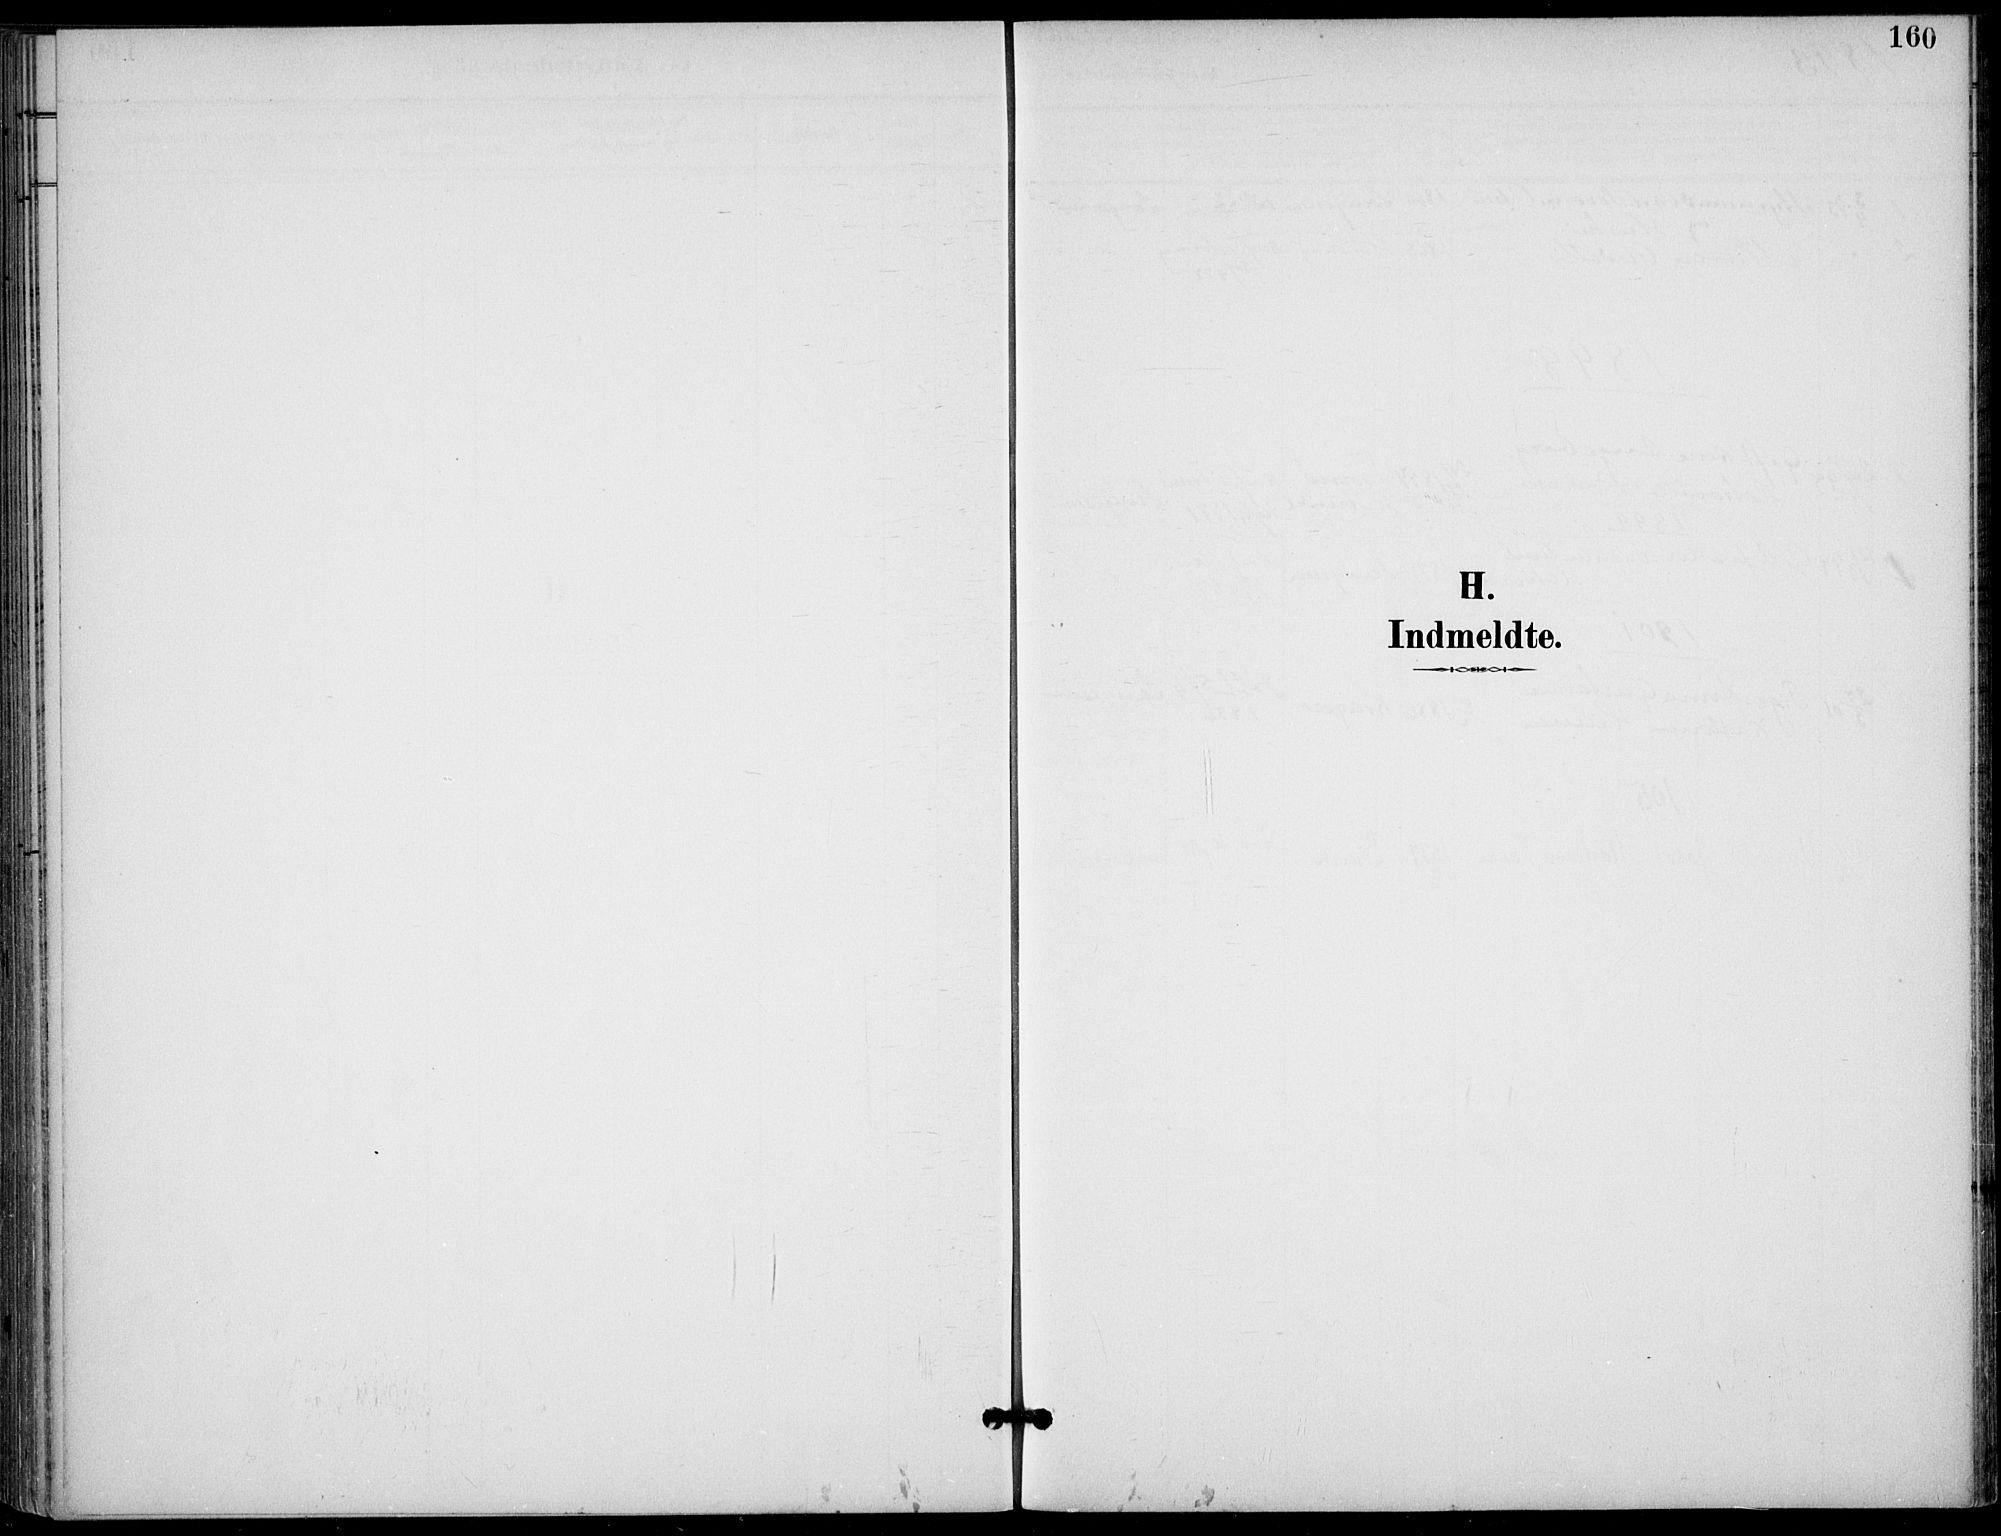 SAKO, Langesund kirkebøker, F/Fa/L0003: Ministerialbok nr. 3, 1893-1907, s. 160